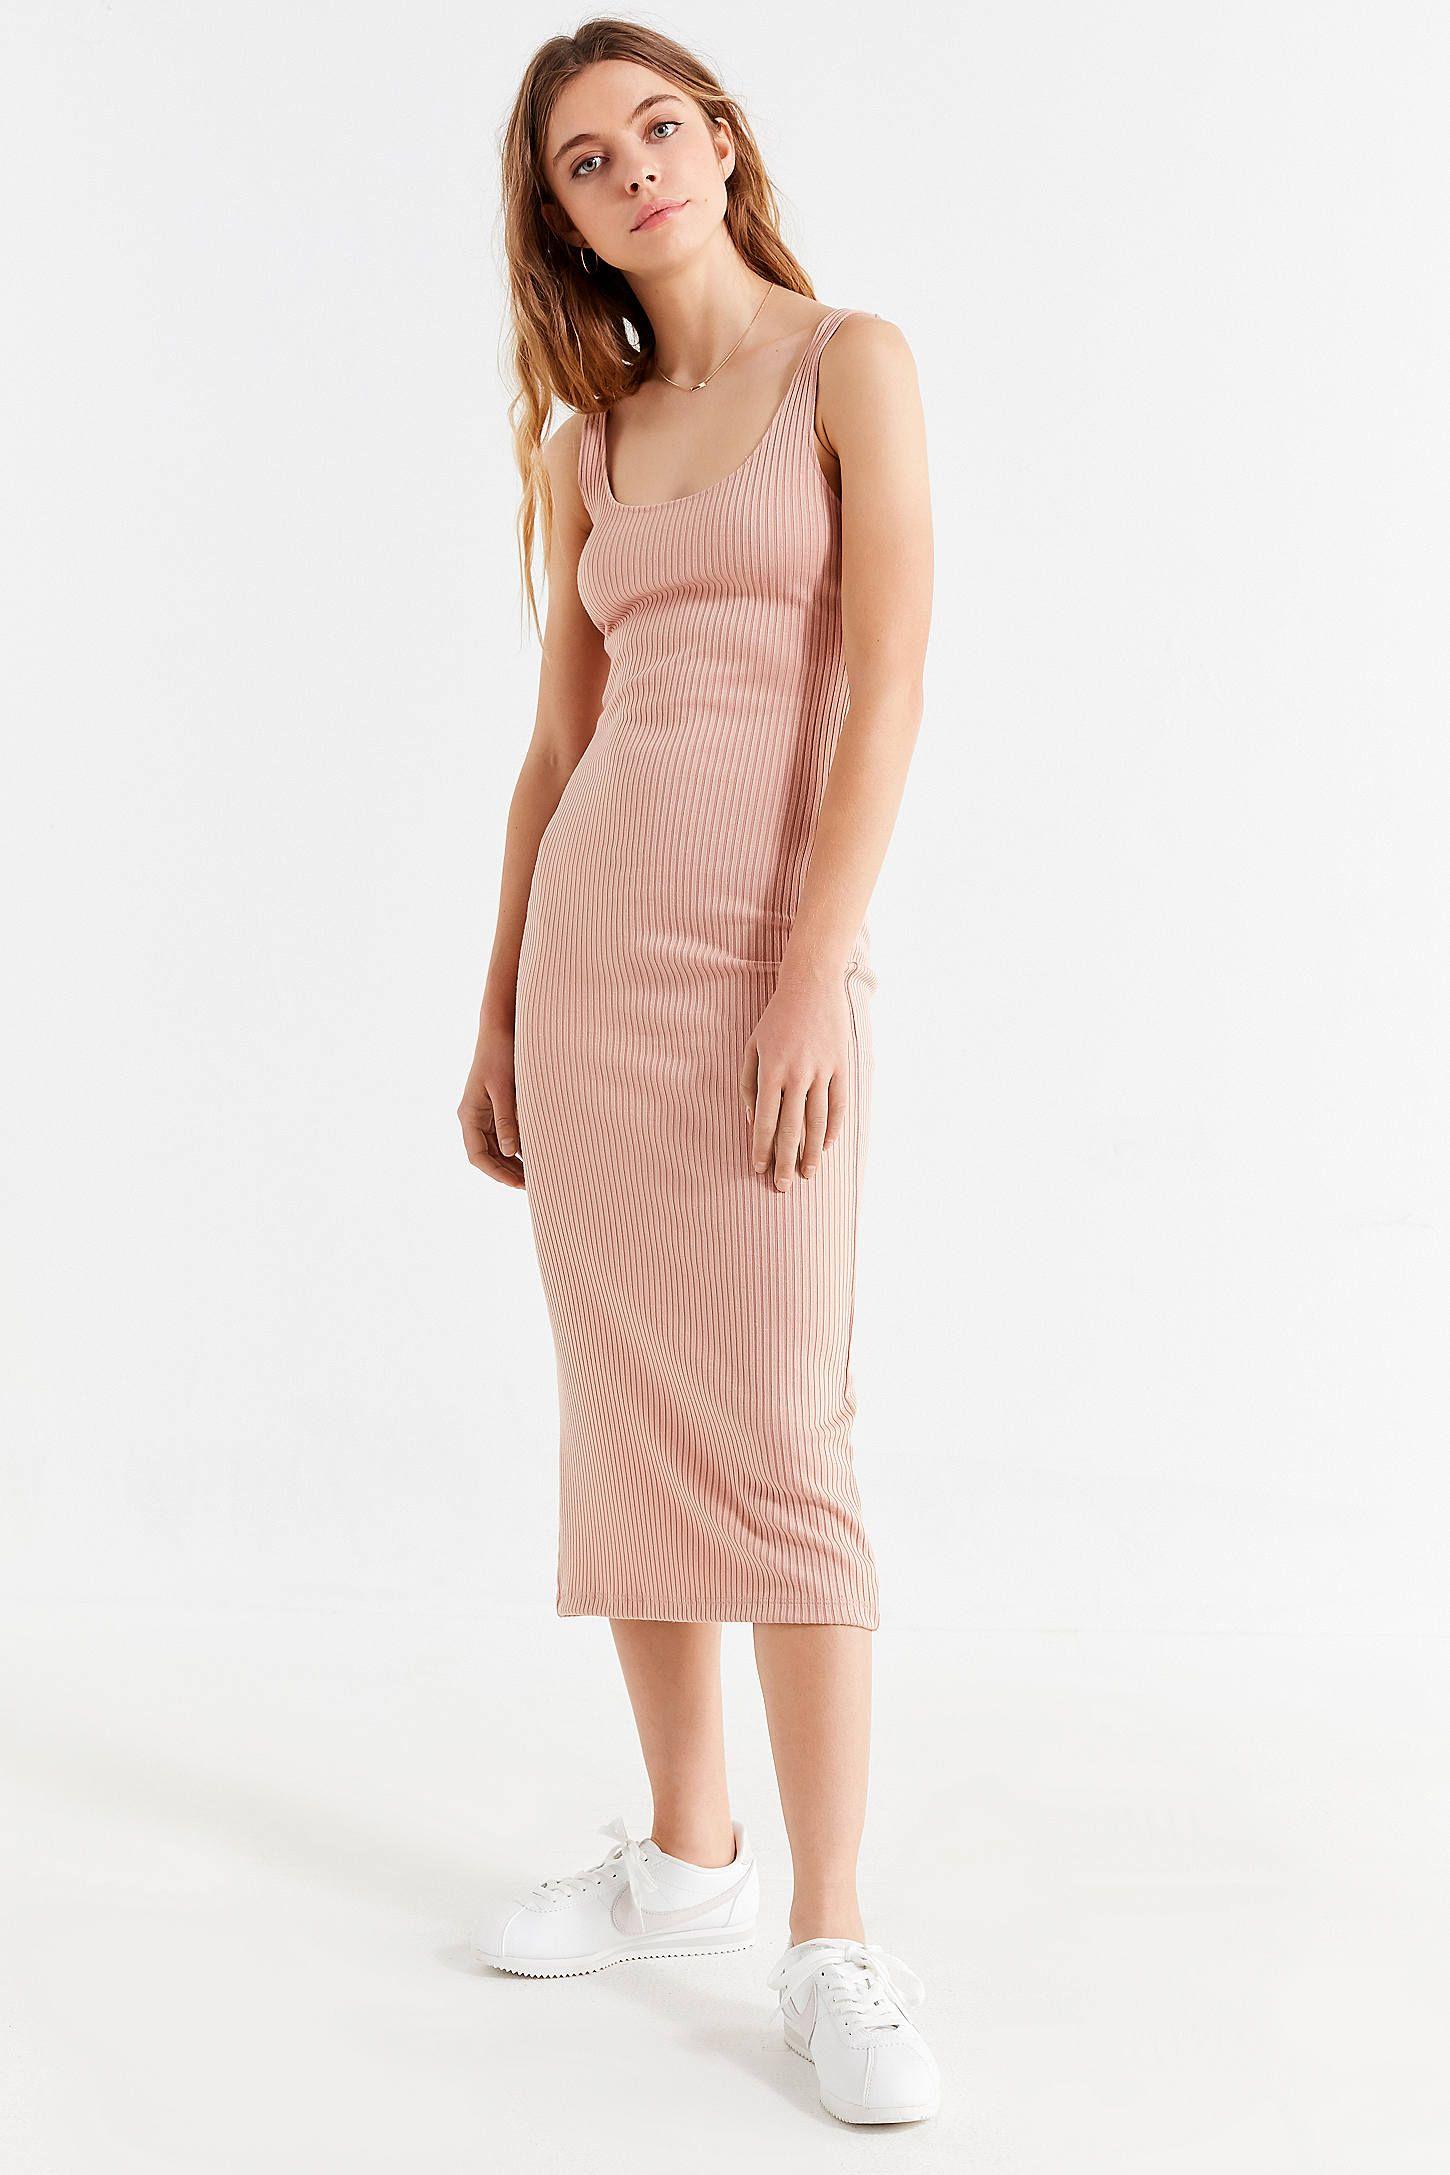 Uo Bella Ribbed Knit Bodycon Midi Dress Midi Dress